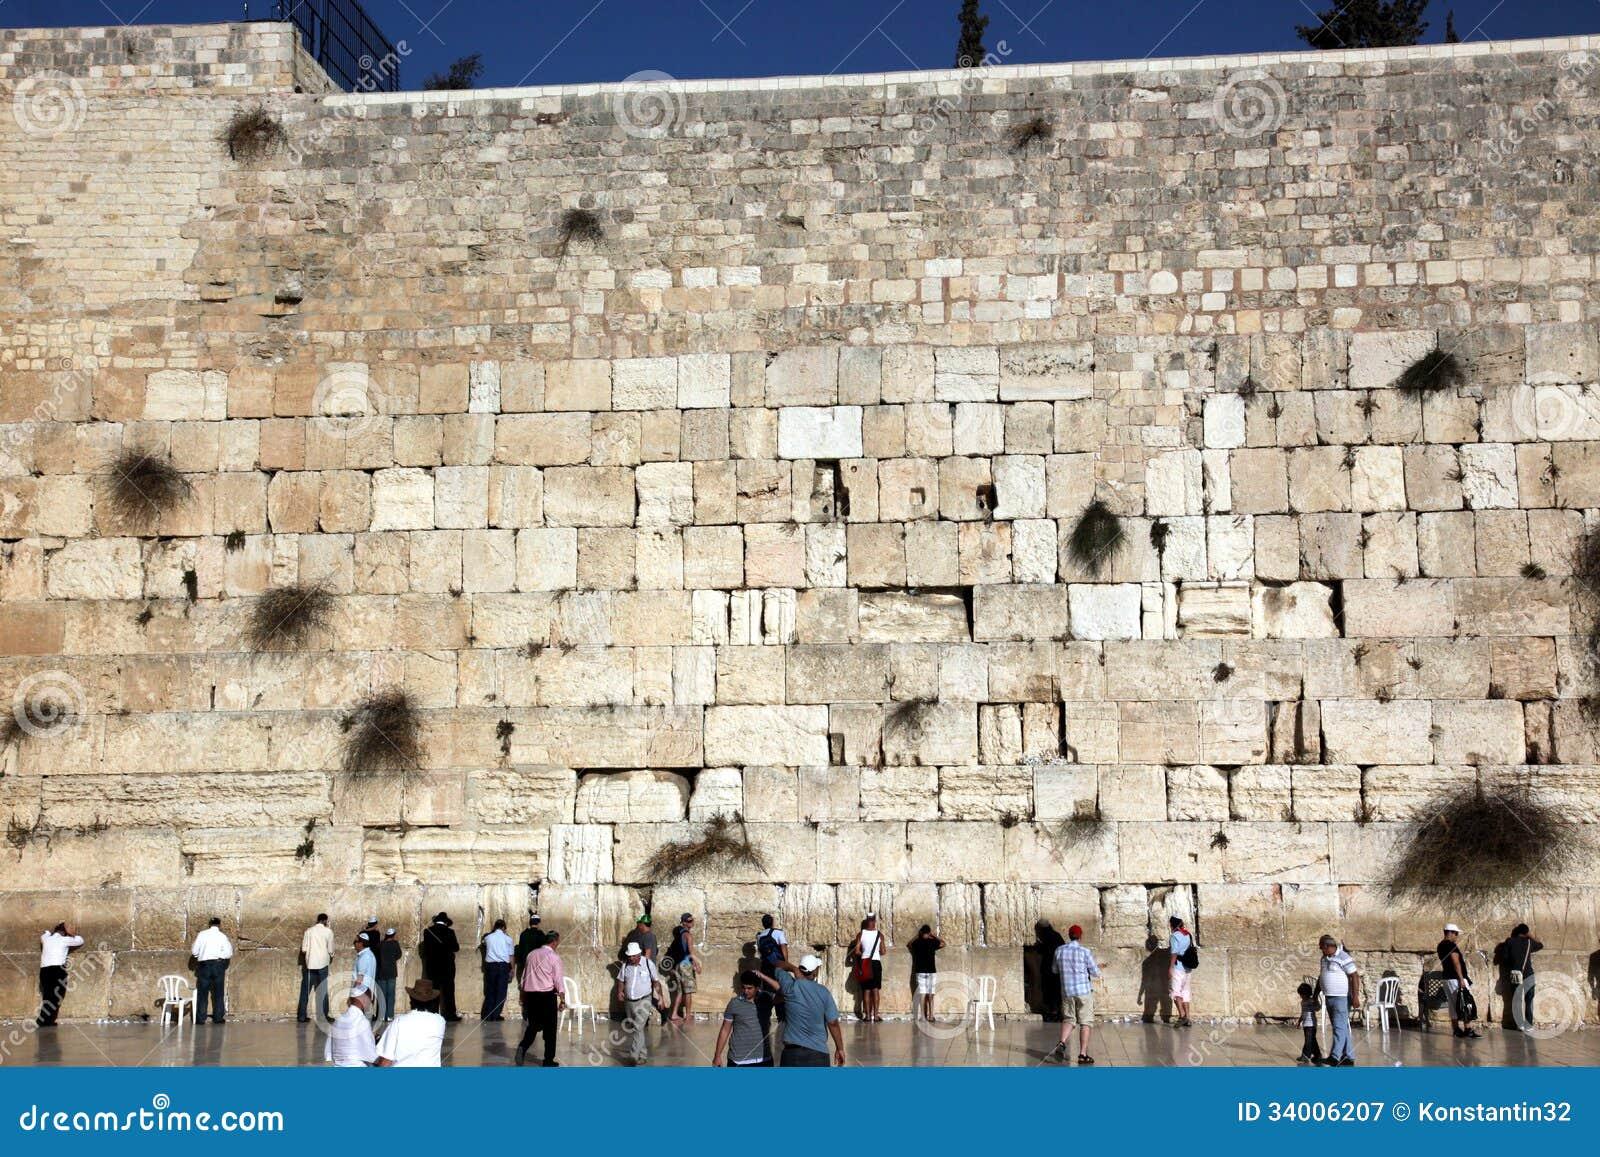 Israel online dating sites free